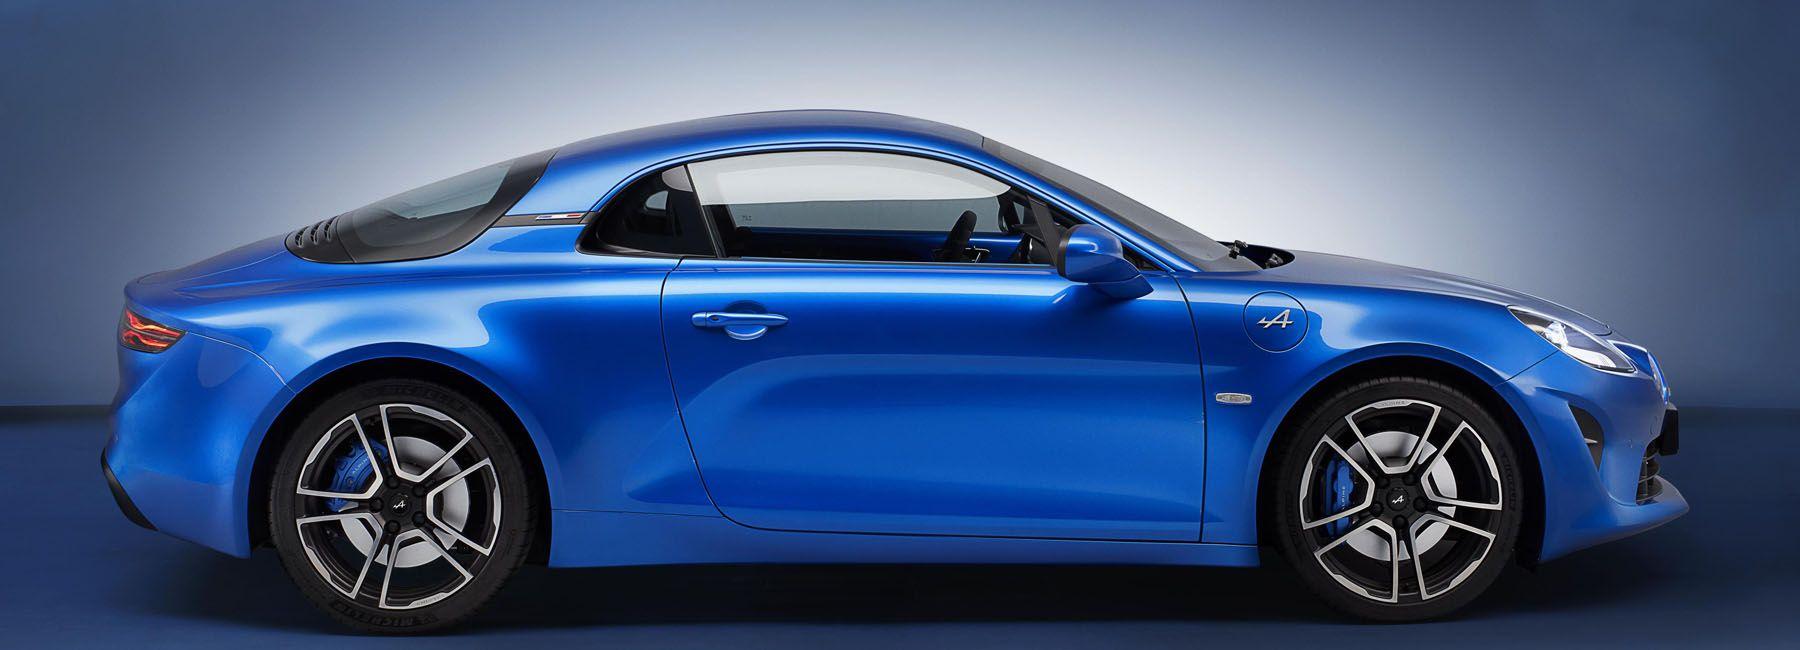 French Brand Alpine Returns With Compact A110 Sports Car Sports Car Car Alpine